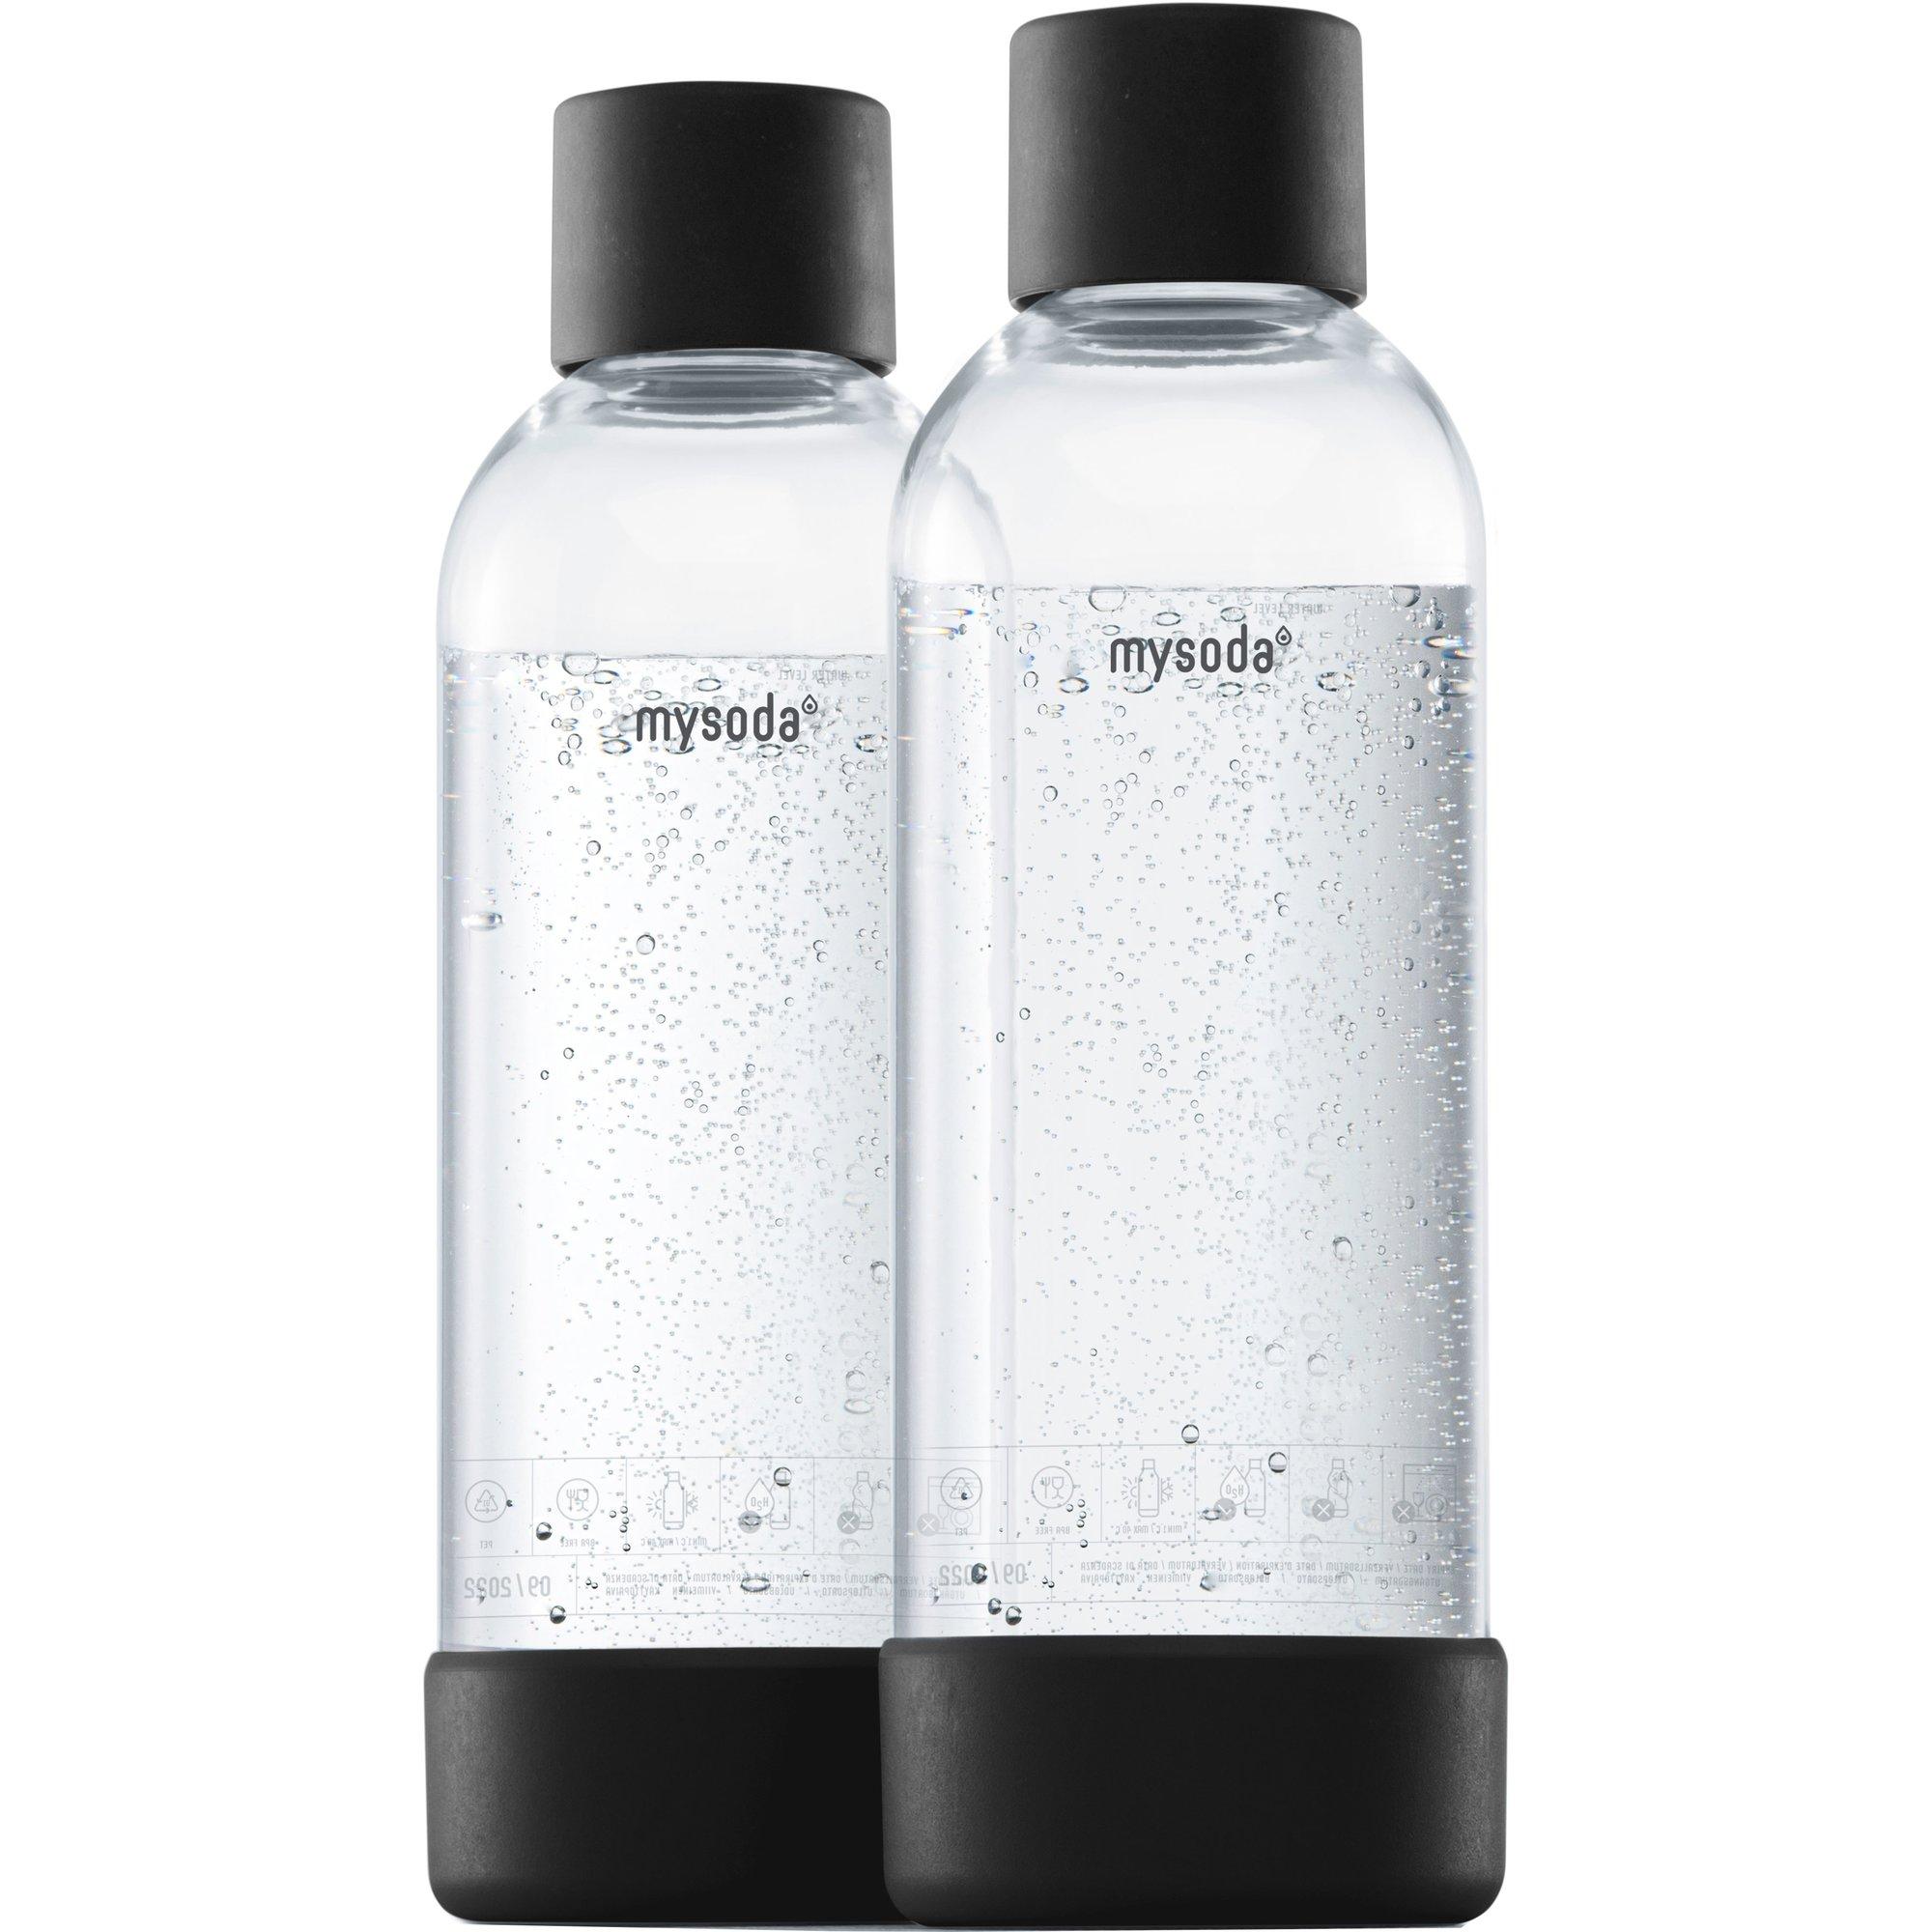 MySoda Vattenflaska 1 liter 2 st. Svart